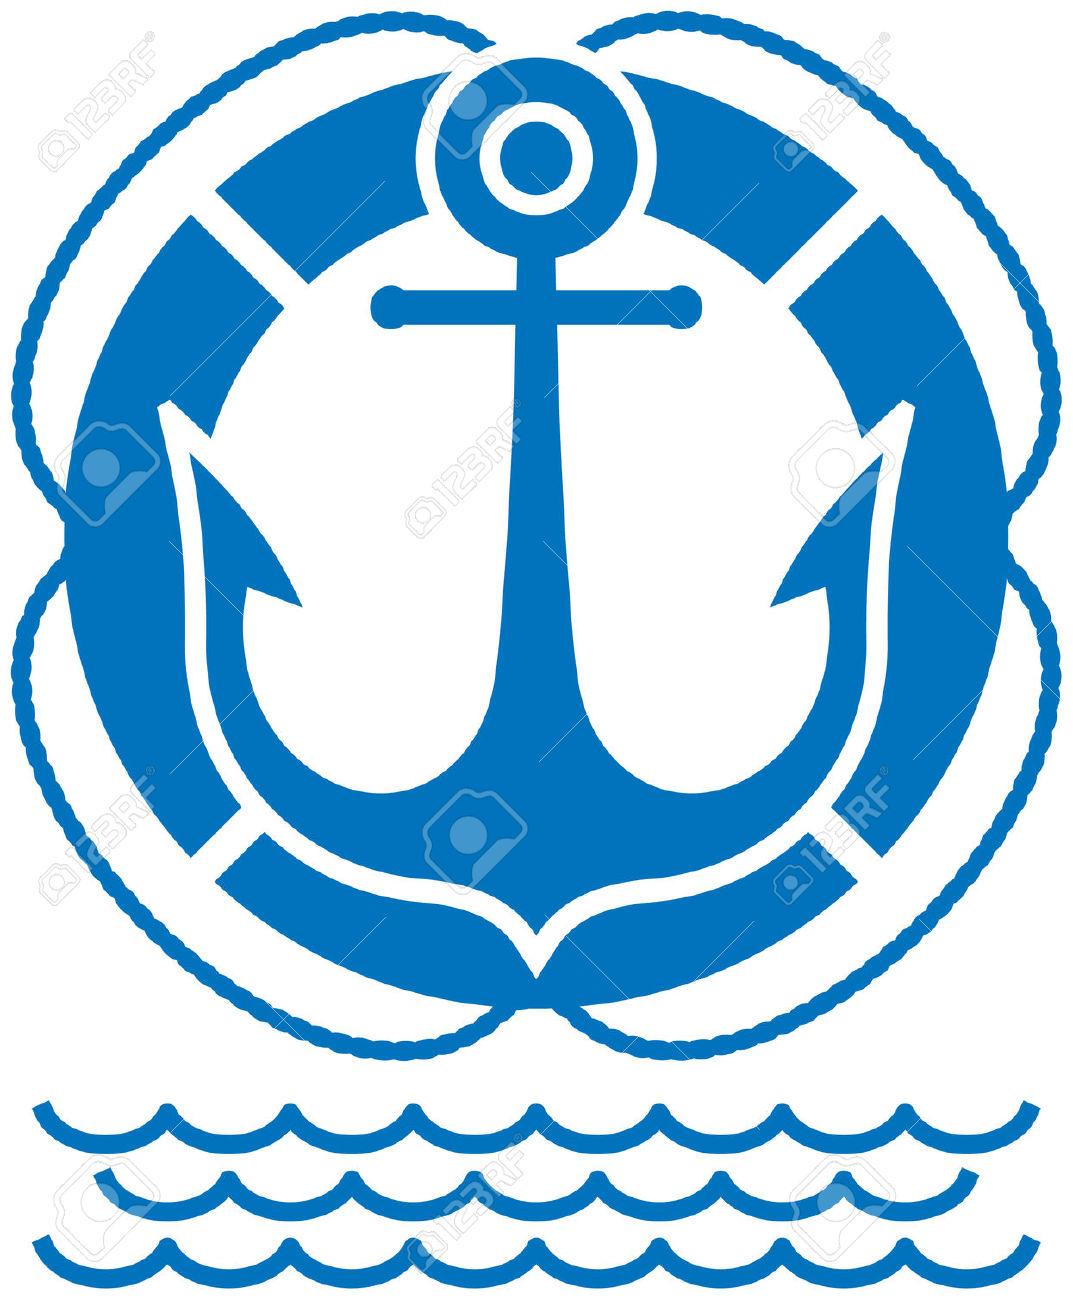 Ocean buoy clipart.